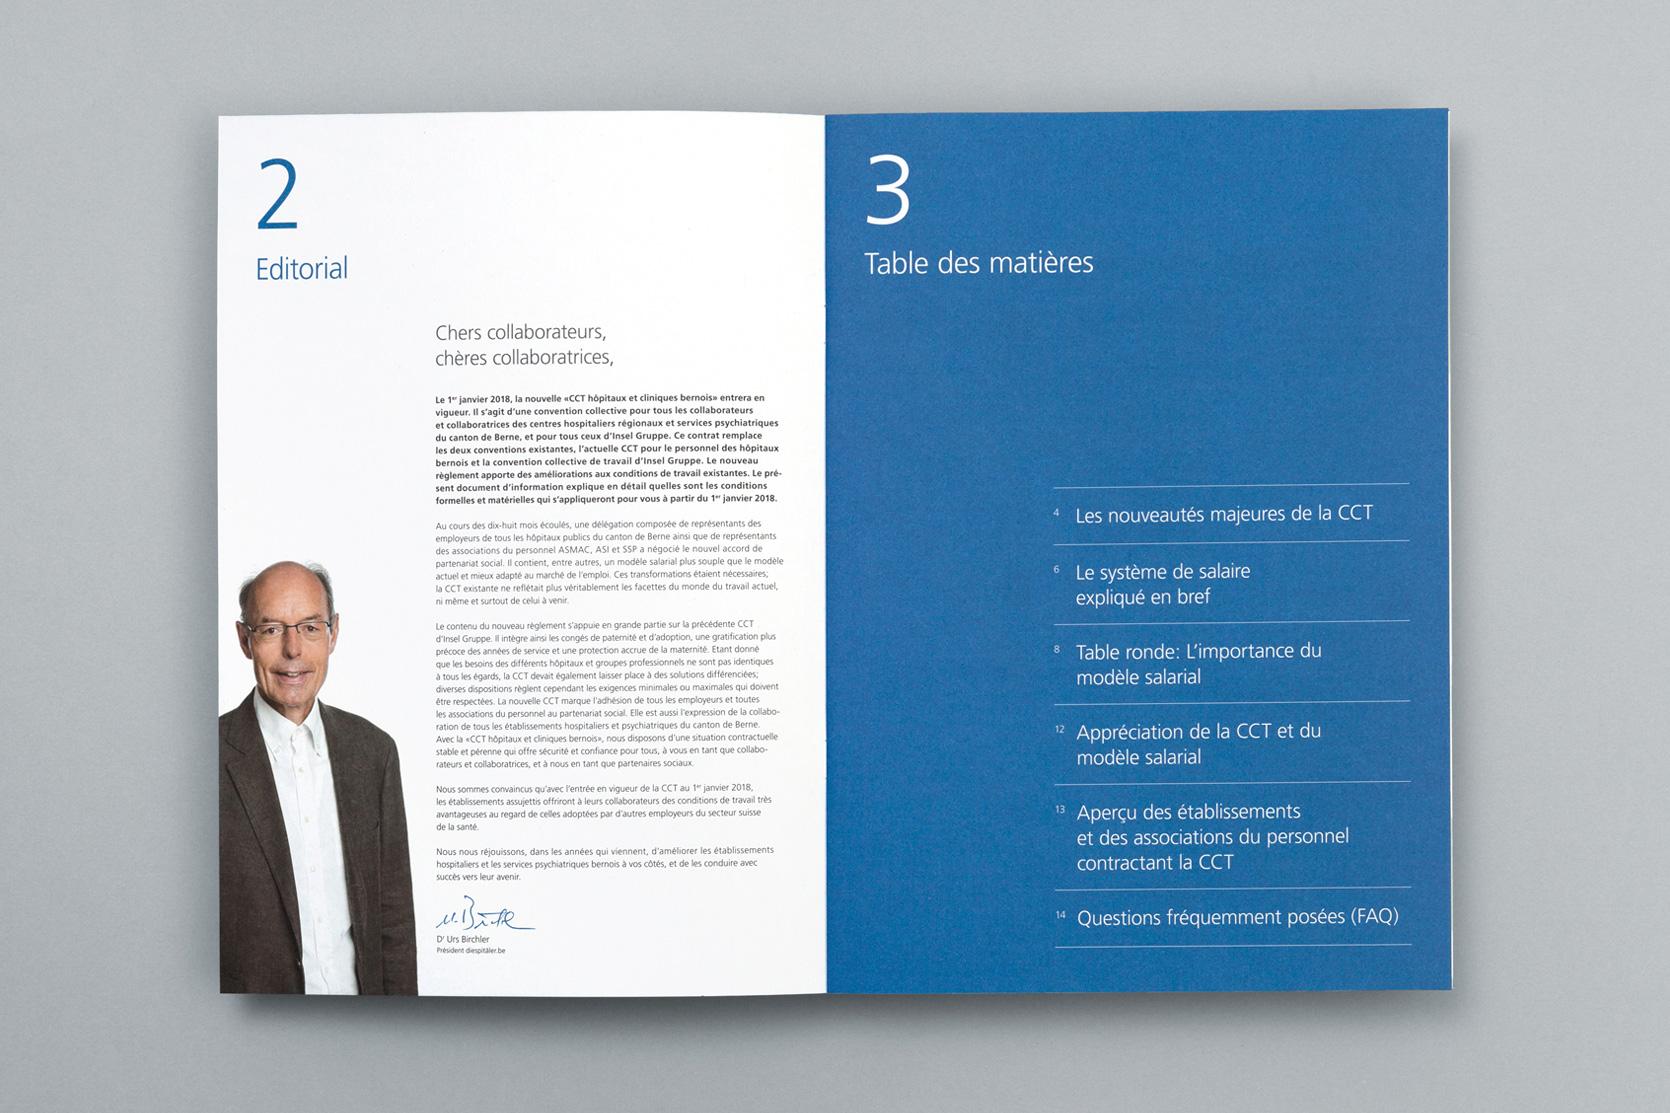 Broschüre Gesamtarbeitsvertrag, Berner Spitäler